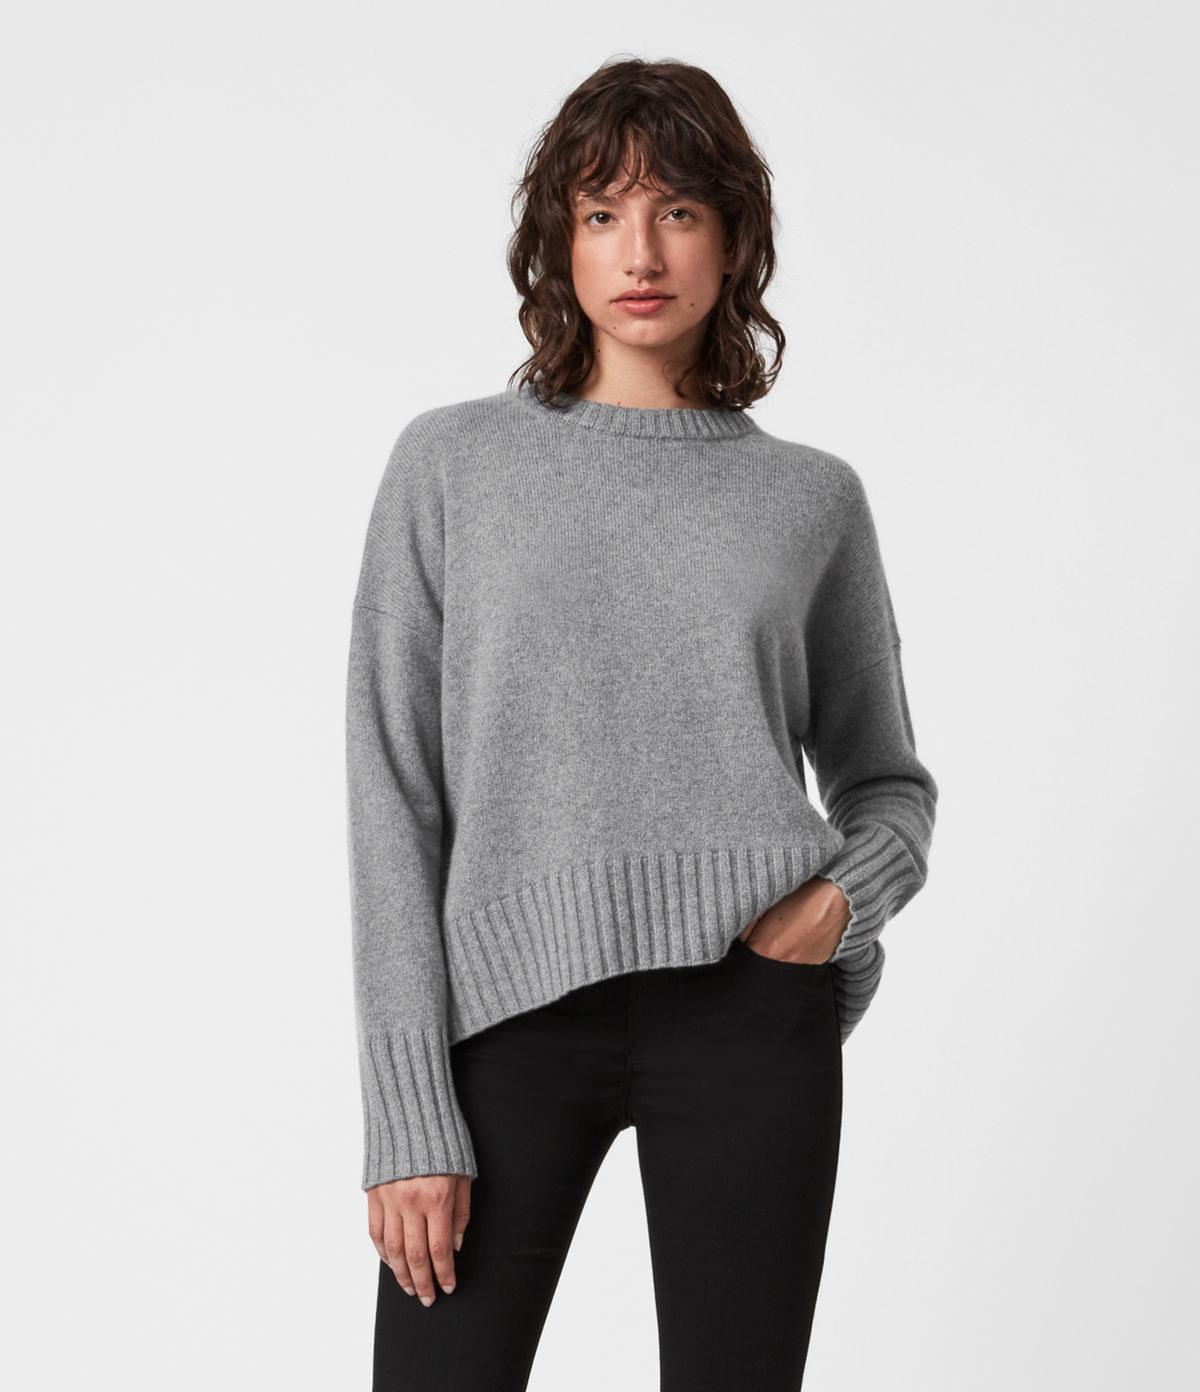 a model in a grey sweater